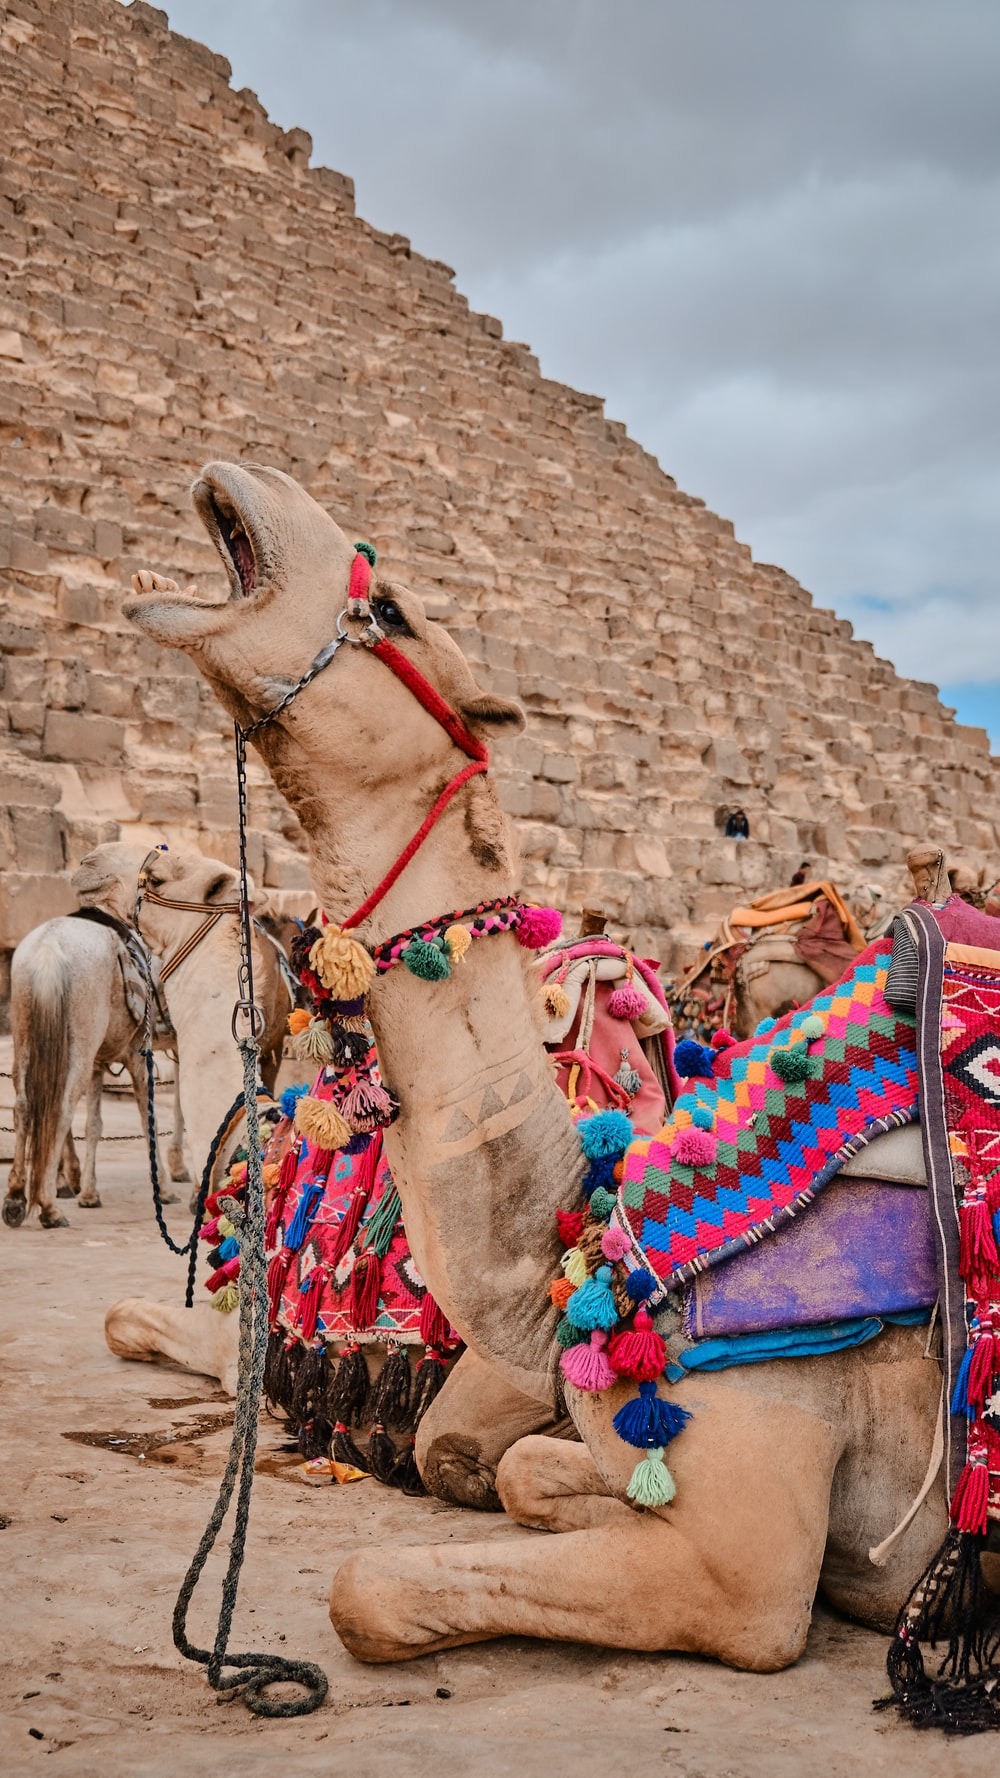 camel sitting on ground near pyramid during daytime